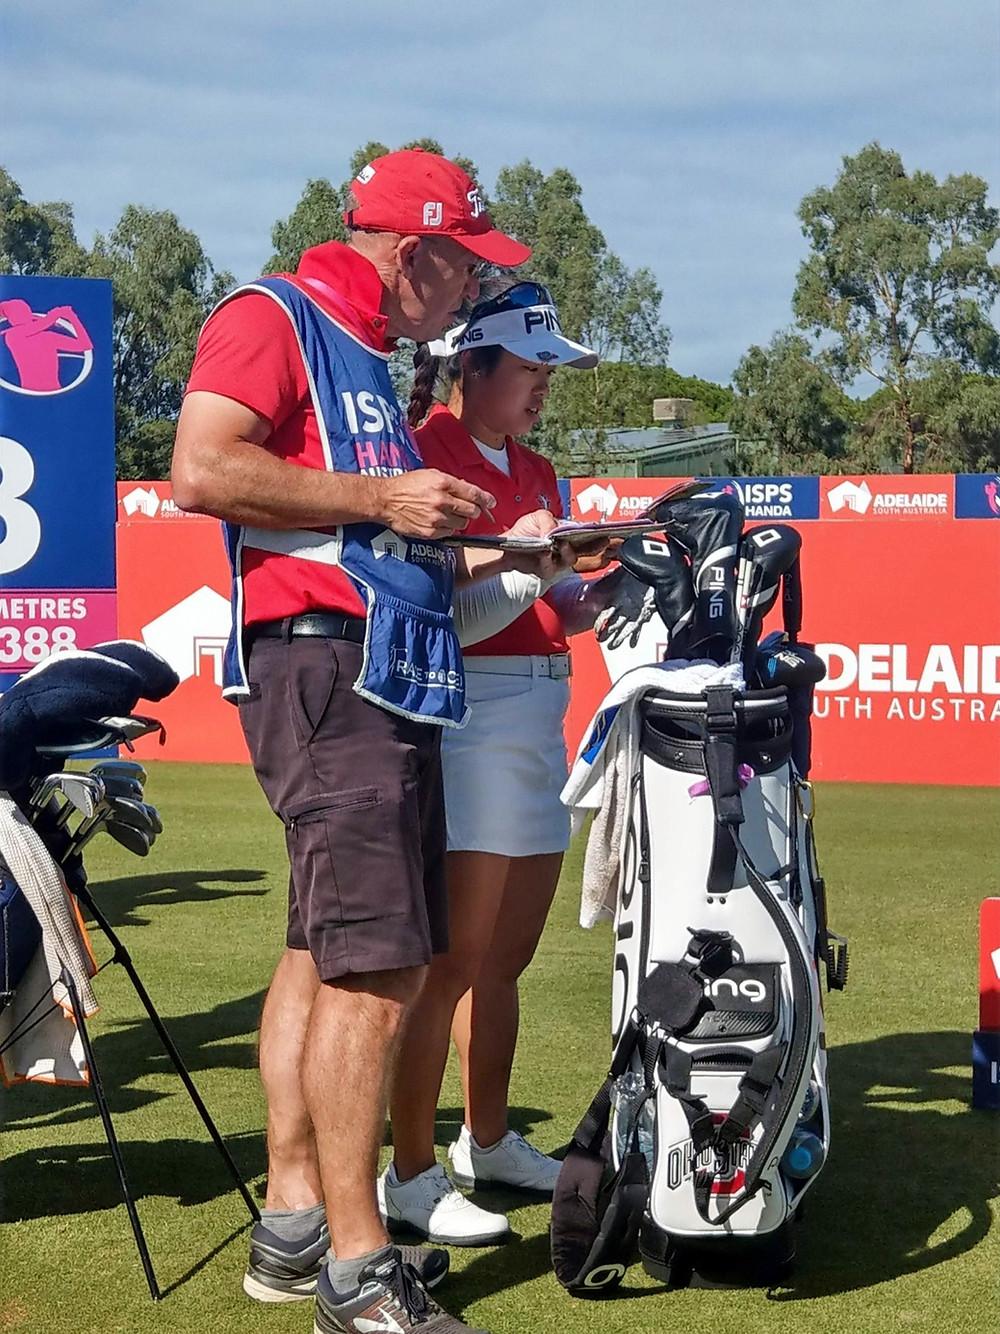 LPGA golfer Jaclyn Lee of Canada, on the tee box at the ISPS Handa Women's Australia Open golf